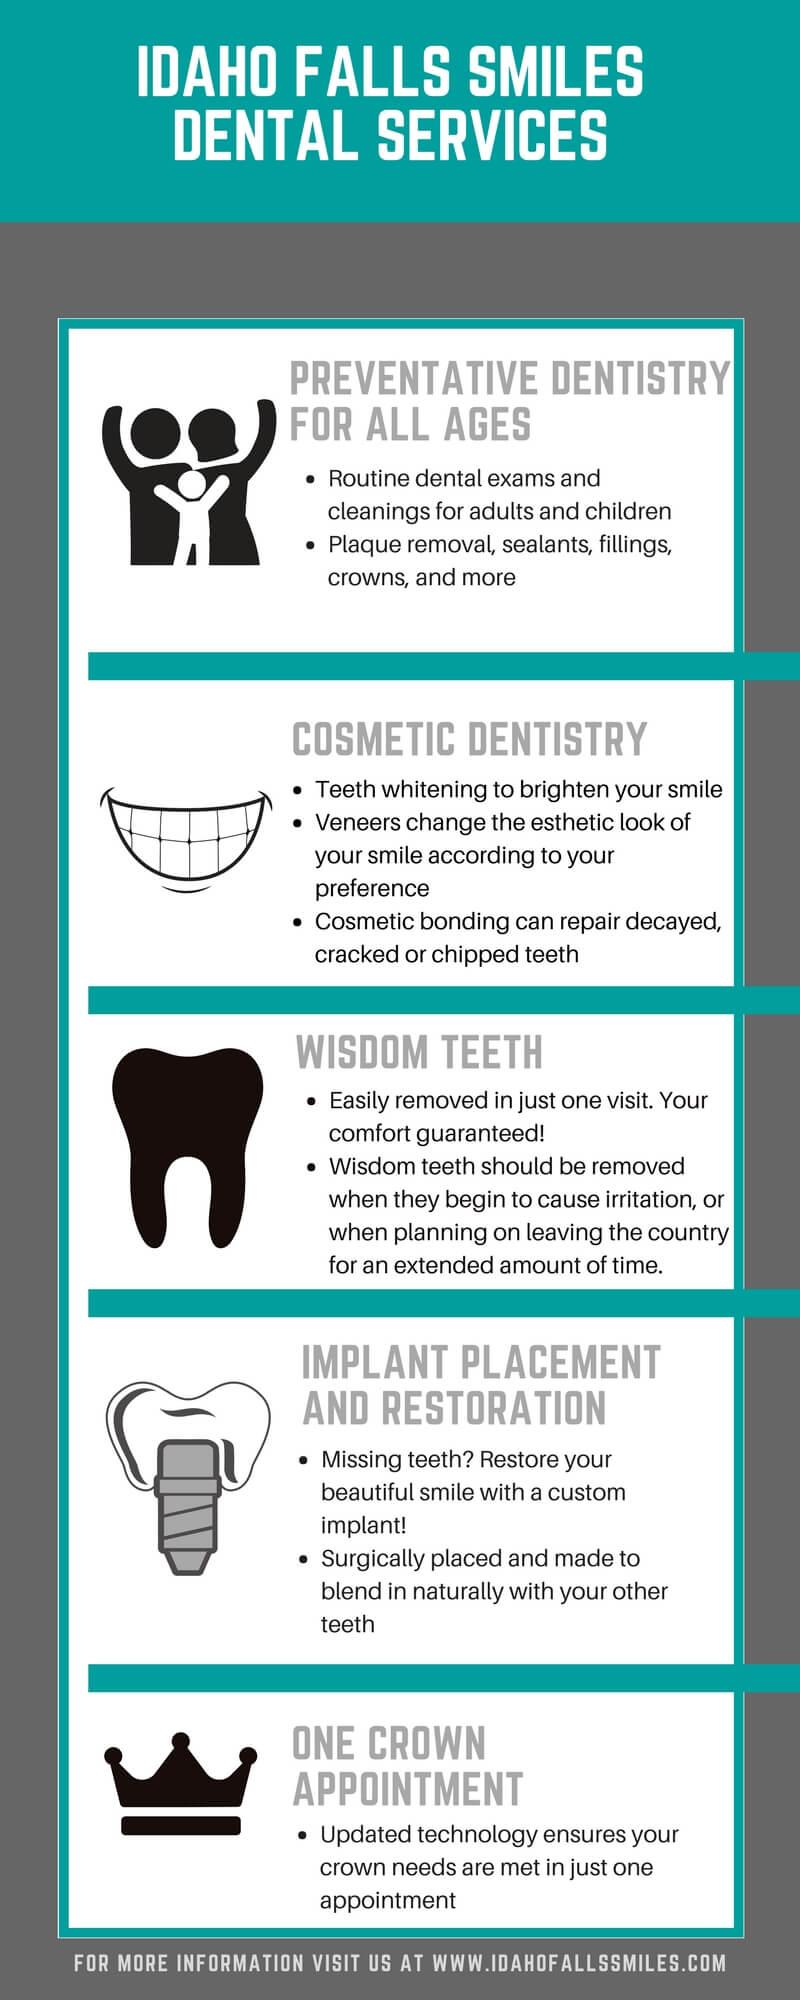 Idaho Falls Smiles Dental Services infograph